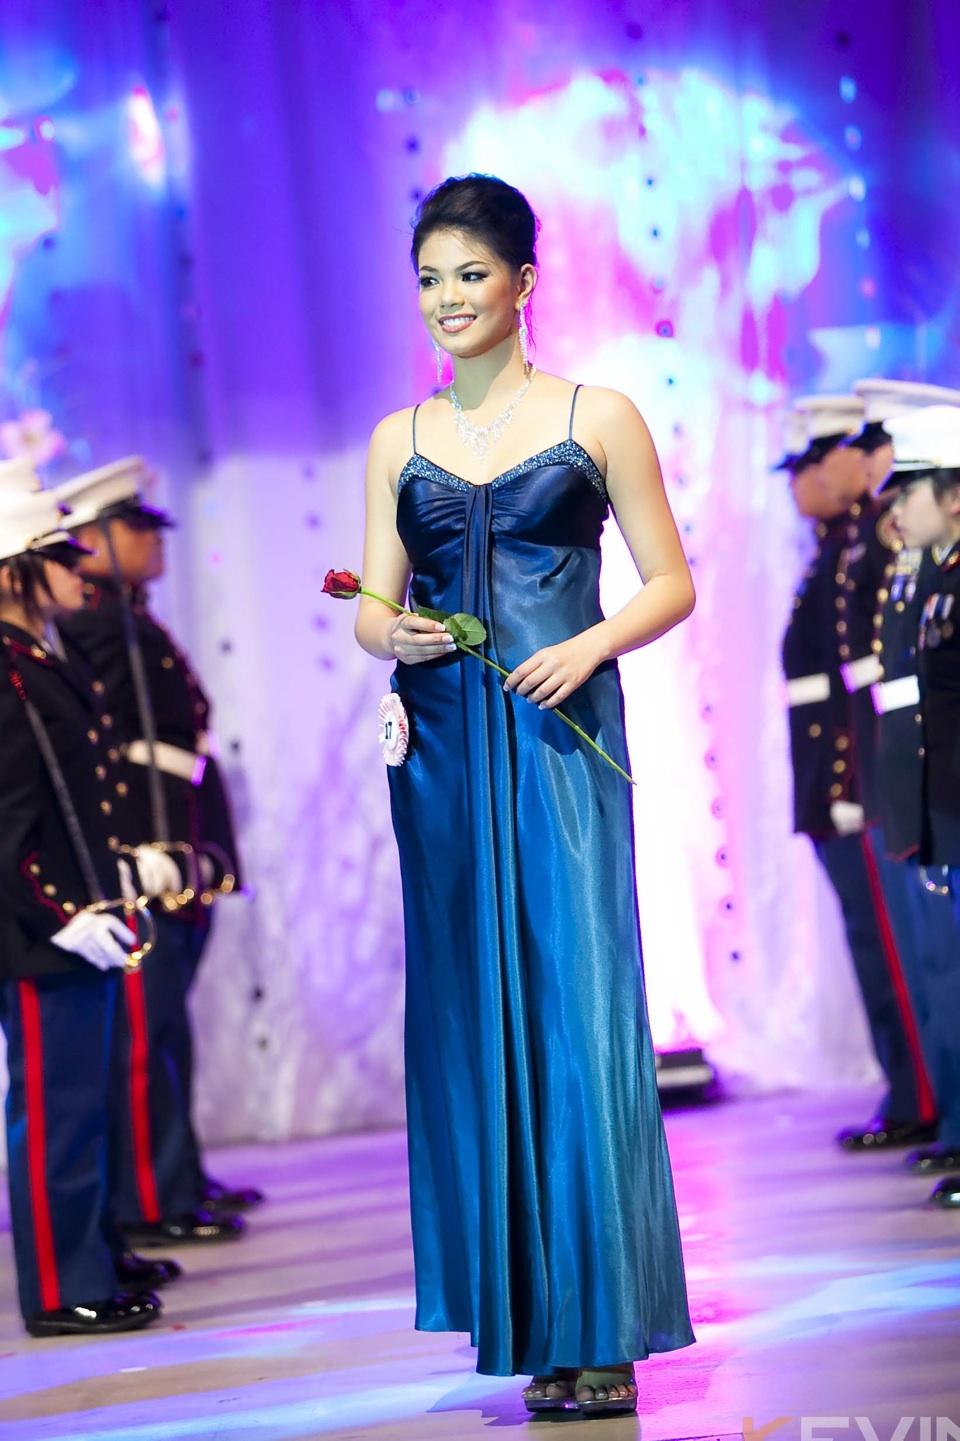 Miss Vietnam - Hoa Hau Ao Dai Bac Cali 2010 - Pageant Day - Image 083